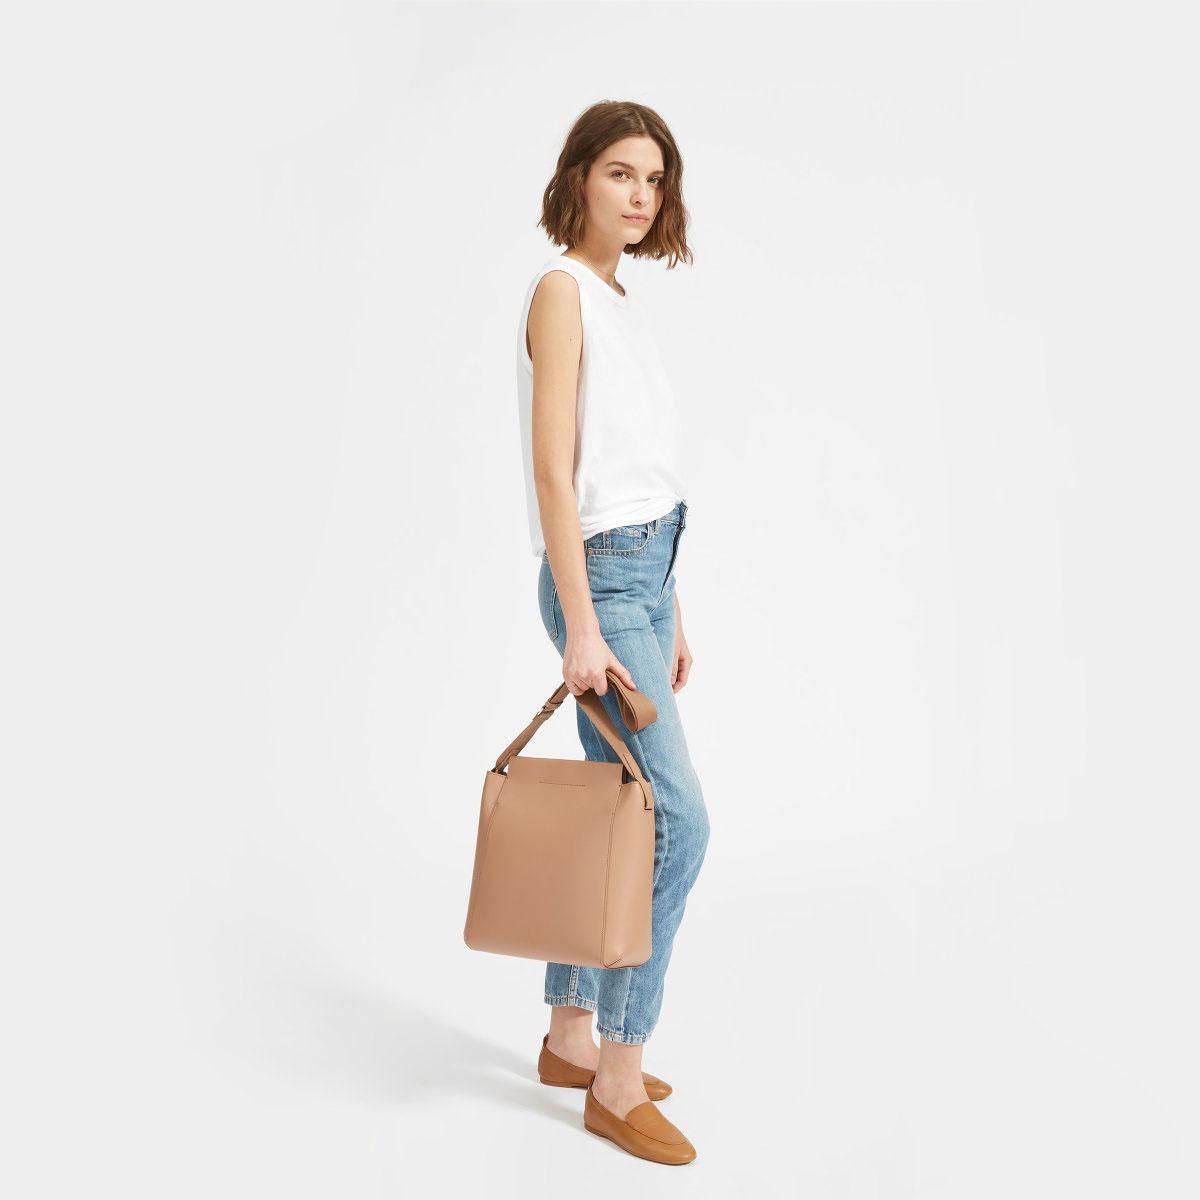 Everlane Bag